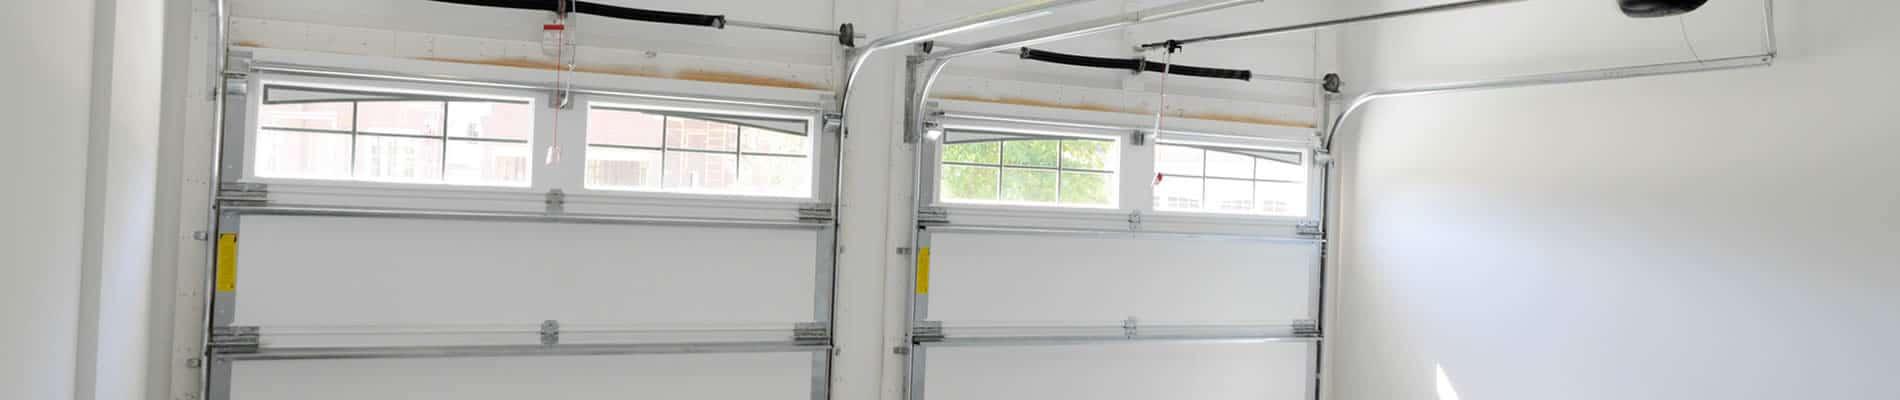 offerte kosten garagedeur 1900br 400hg 70 vergelijken. Black Bedroom Furniture Sets. Home Design Ideas